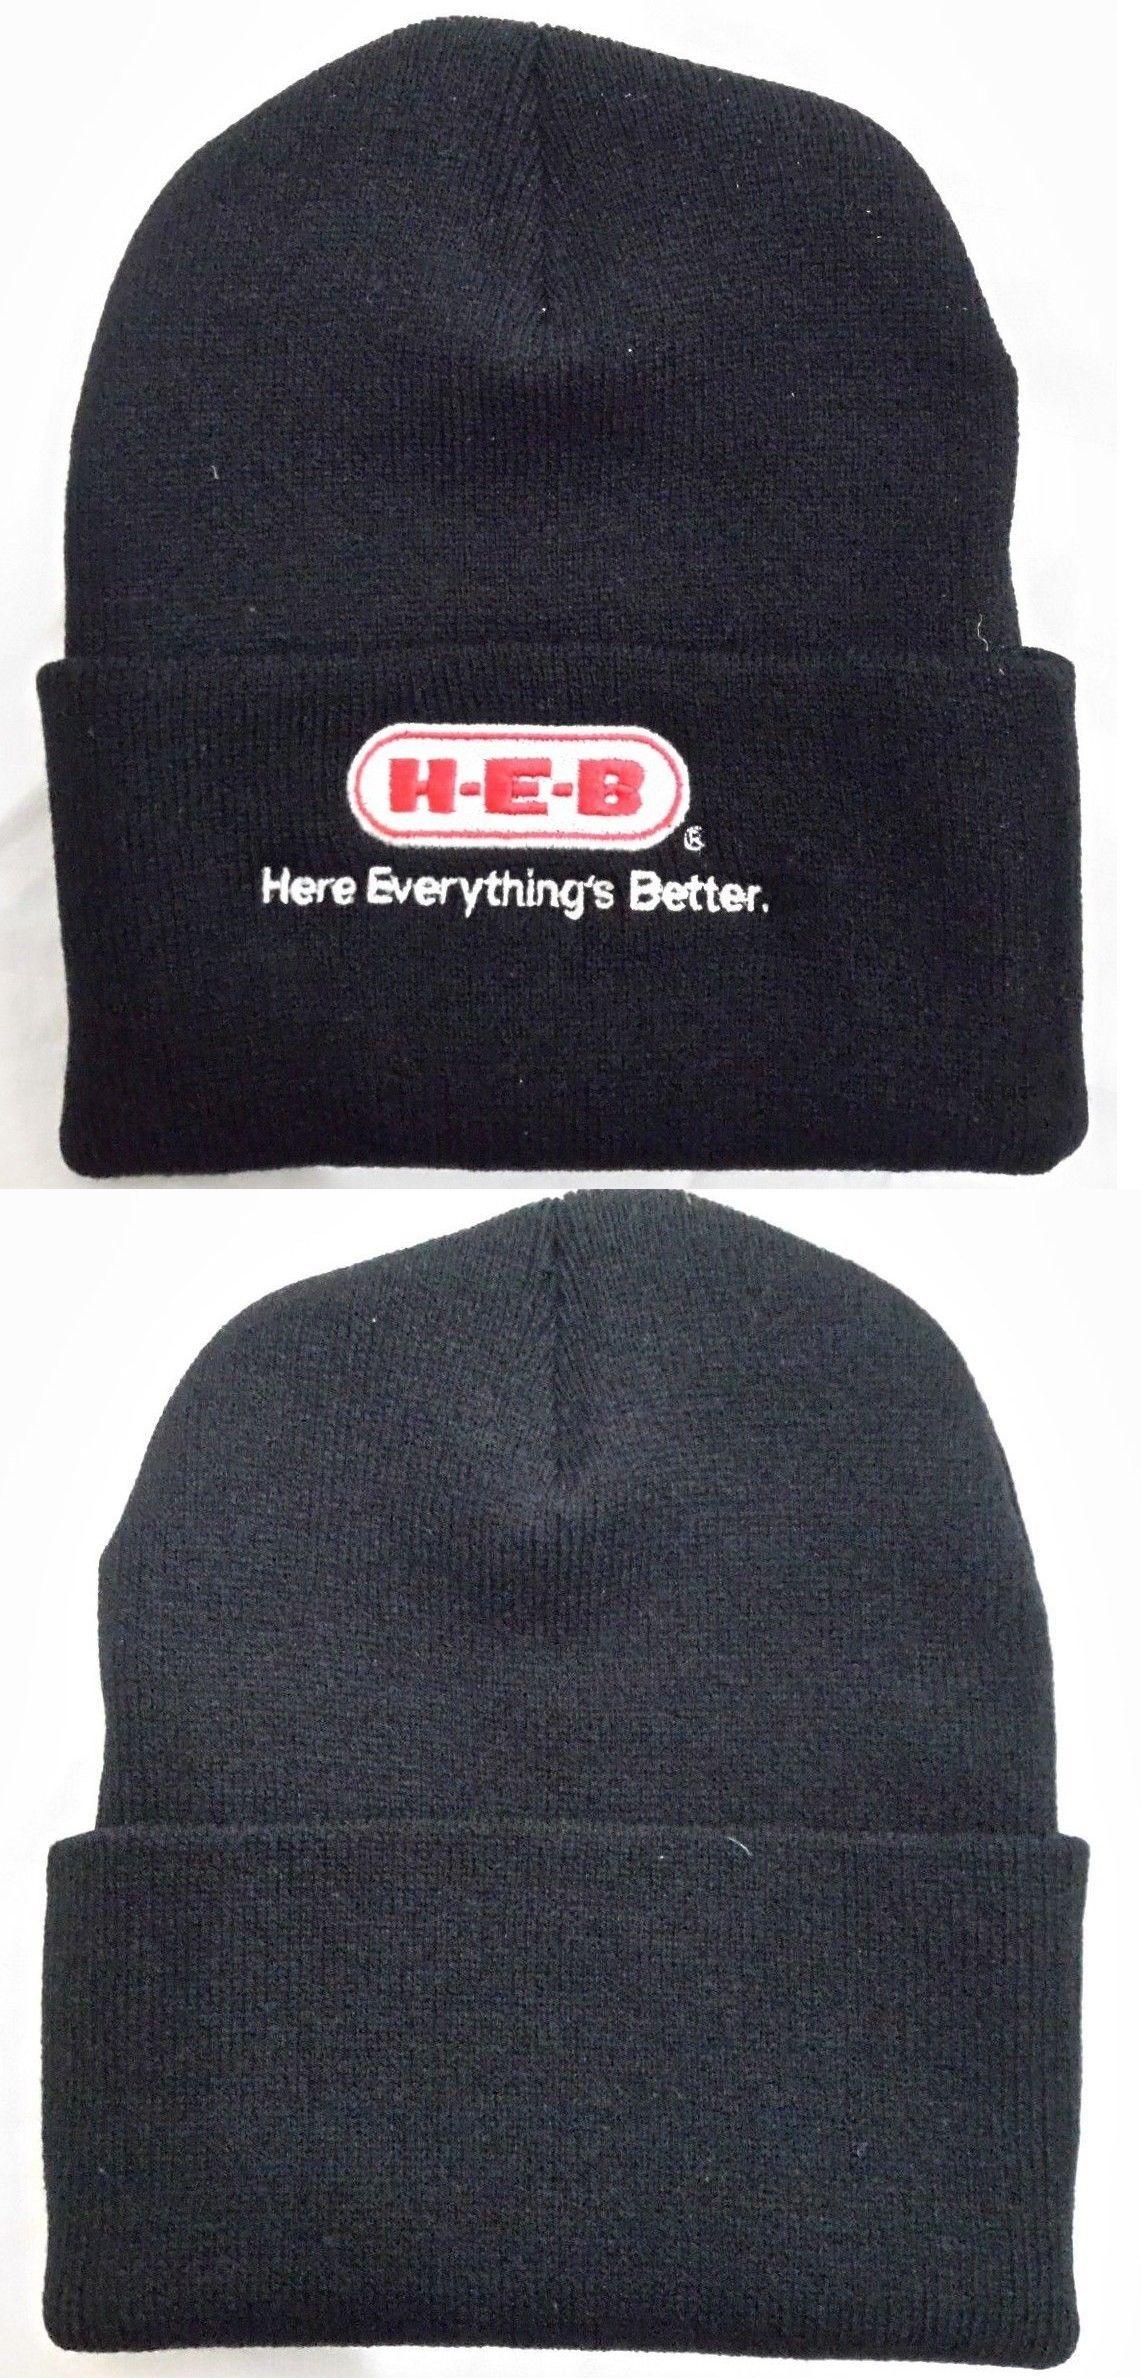 0ce98ec98 Hats 163526: H-E-B Black Knit Beanie Winter Hat Toque Skull Cap ...